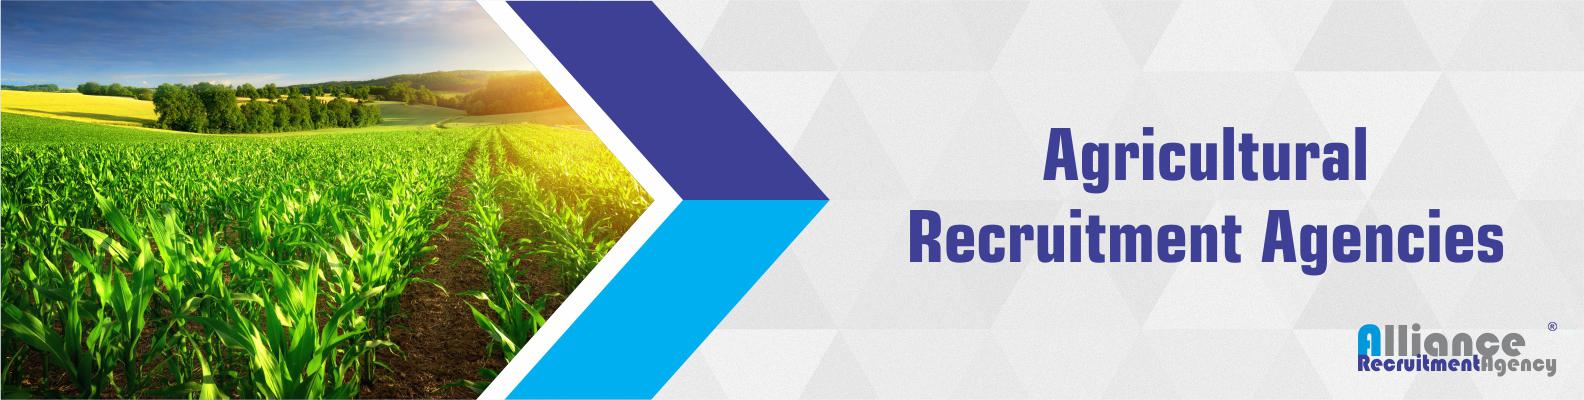 agricultural recruitment agencies